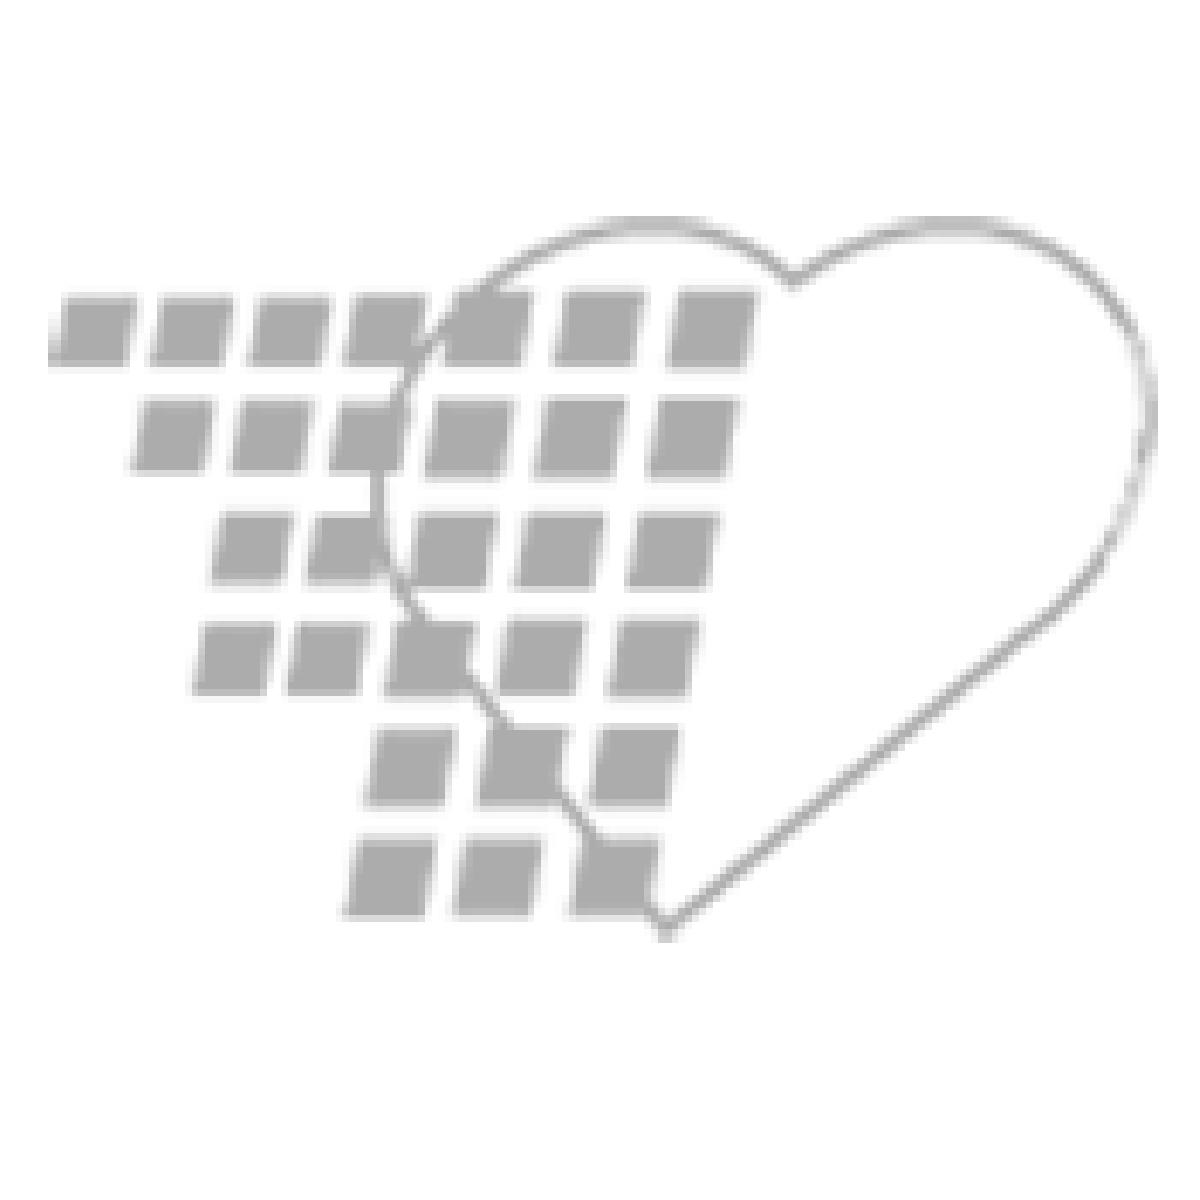 02-43-9325 Clear Choice Adapter Clip